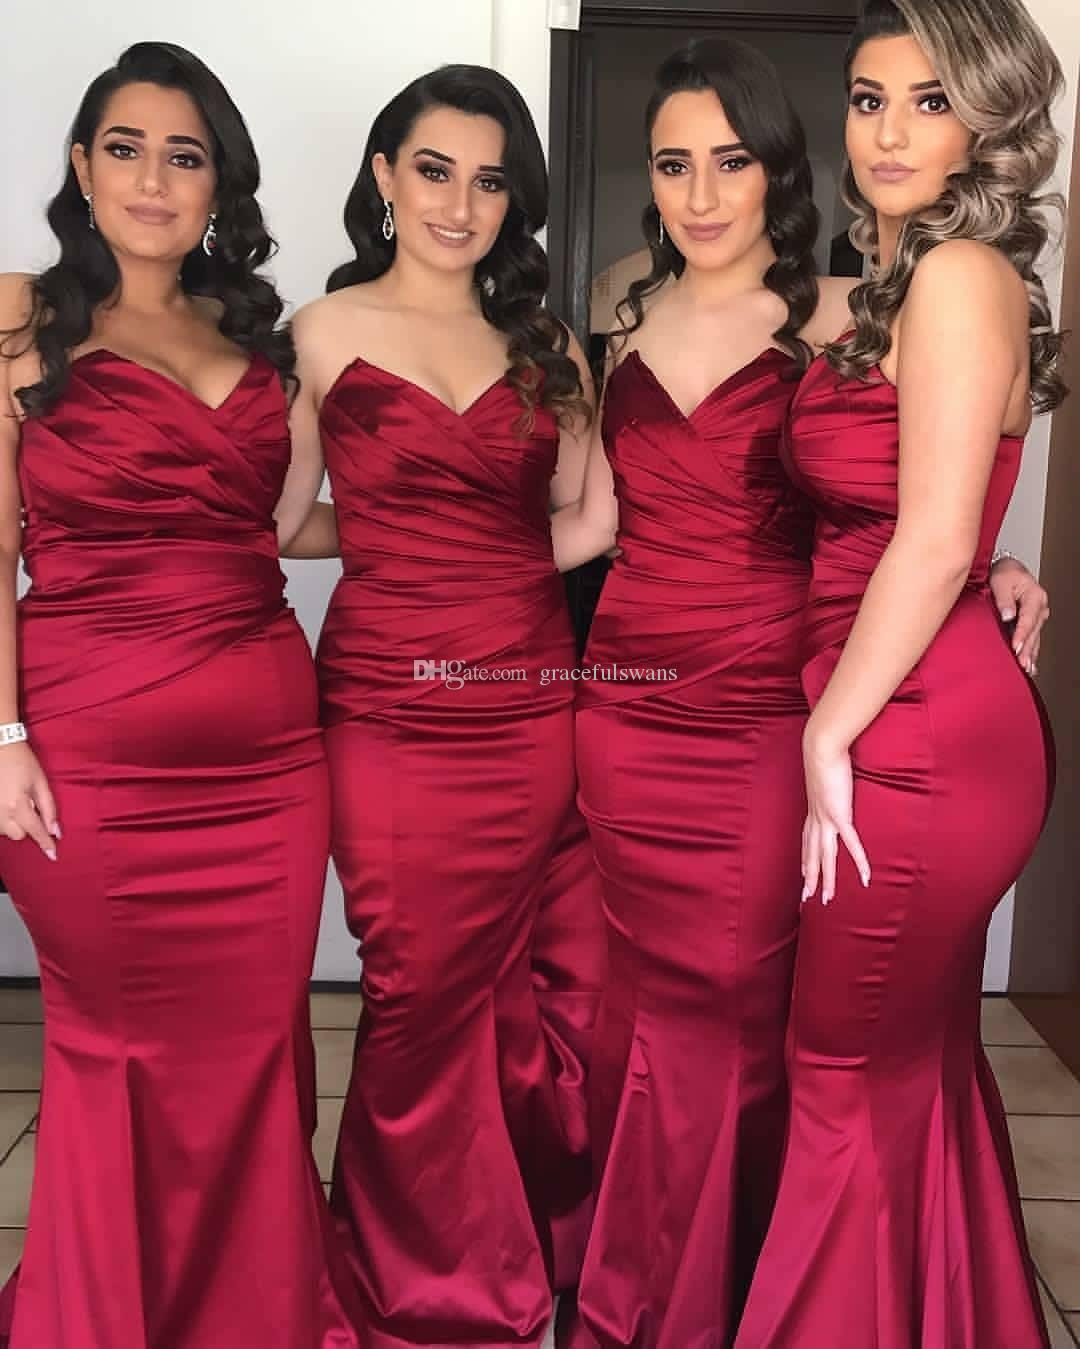 c88225ccf1f0d Mermaid Burgundy Bridesmaid Dresses Long Sweetheart Dark Red Satin Maid Of  Honor Dresses Ruched Wedding Guest Dresses Feestjurken Green Bridesmaid  Dress ...